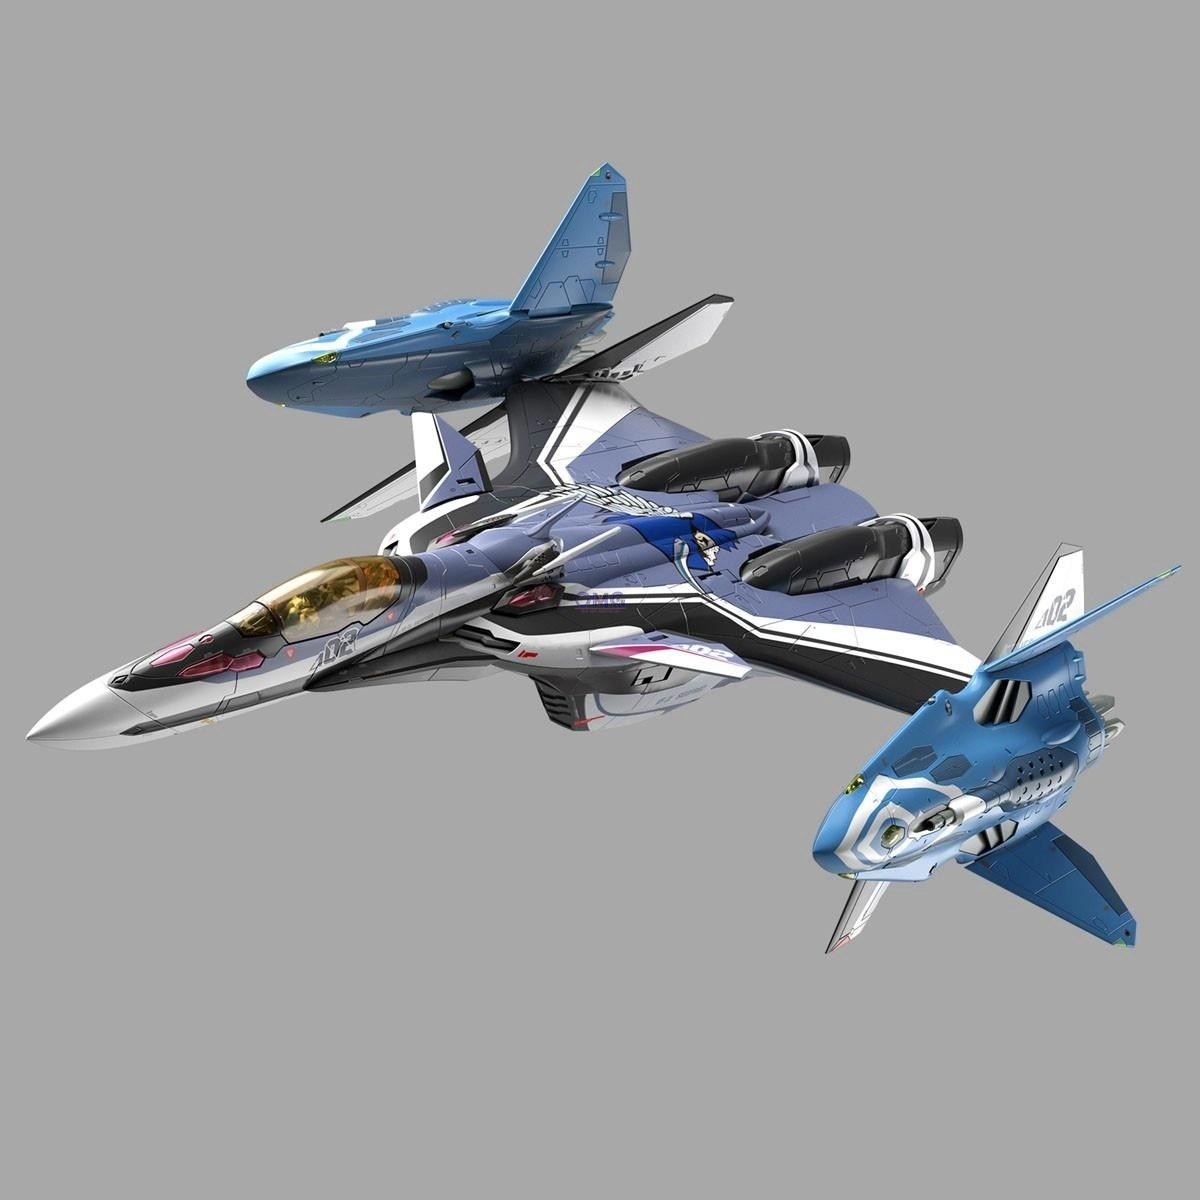 Bandai 1 72 VF-31F Siegfried Lill Draken Equipment (Hayate Immelman Custom)1.0.jpg